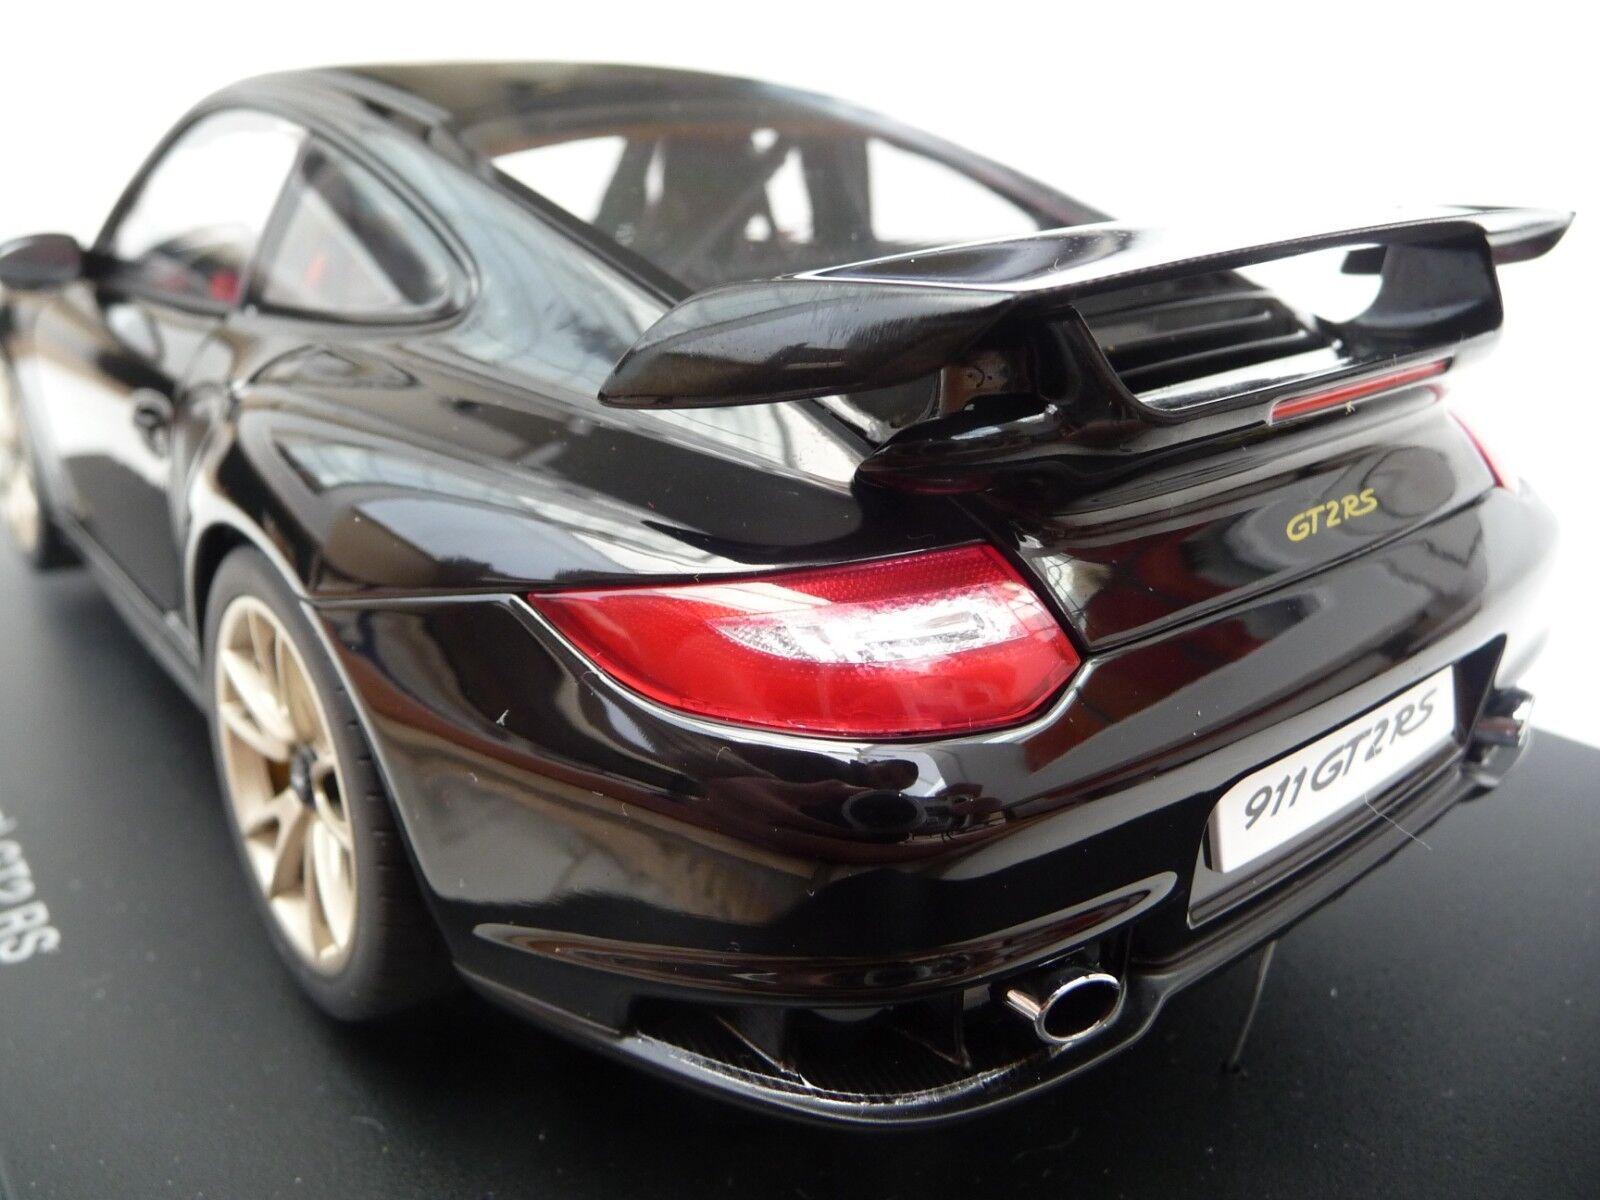 descuento de ventas Autoart 1 18 Porsche 911 (997) GT2 RS RS RS 2010 Negro AA77962  100% precio garantizado